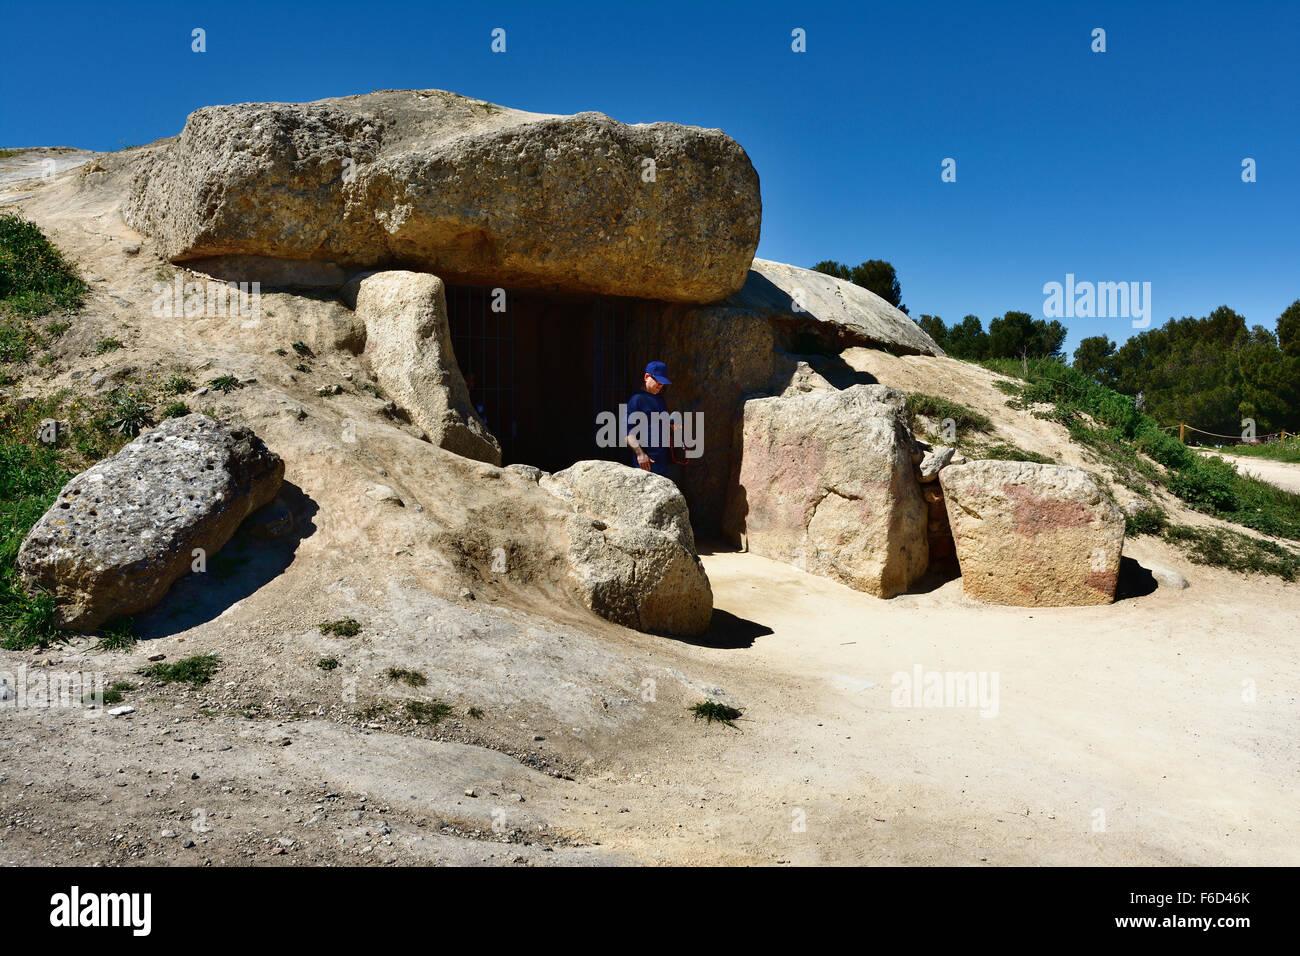 The Dolmen of Menga. Antequera. Malaga. Spain Stock Photo